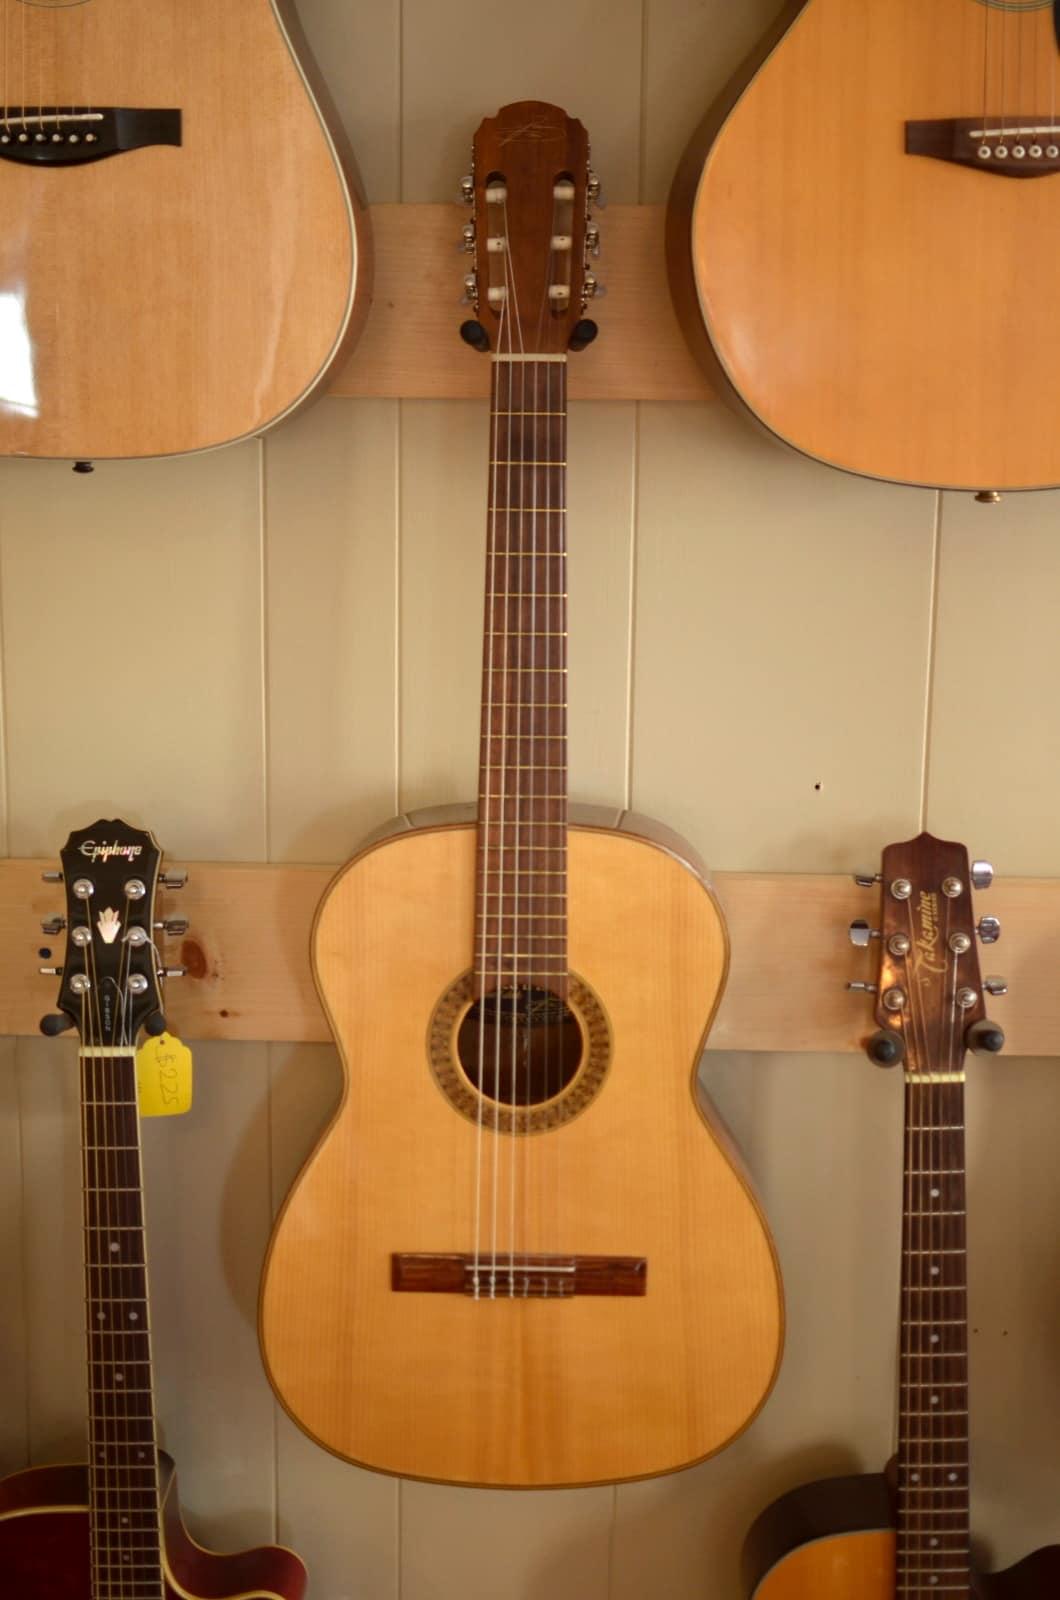 giannini 1900 serie estudo classical acoustic guitar made in reverb. Black Bedroom Furniture Sets. Home Design Ideas